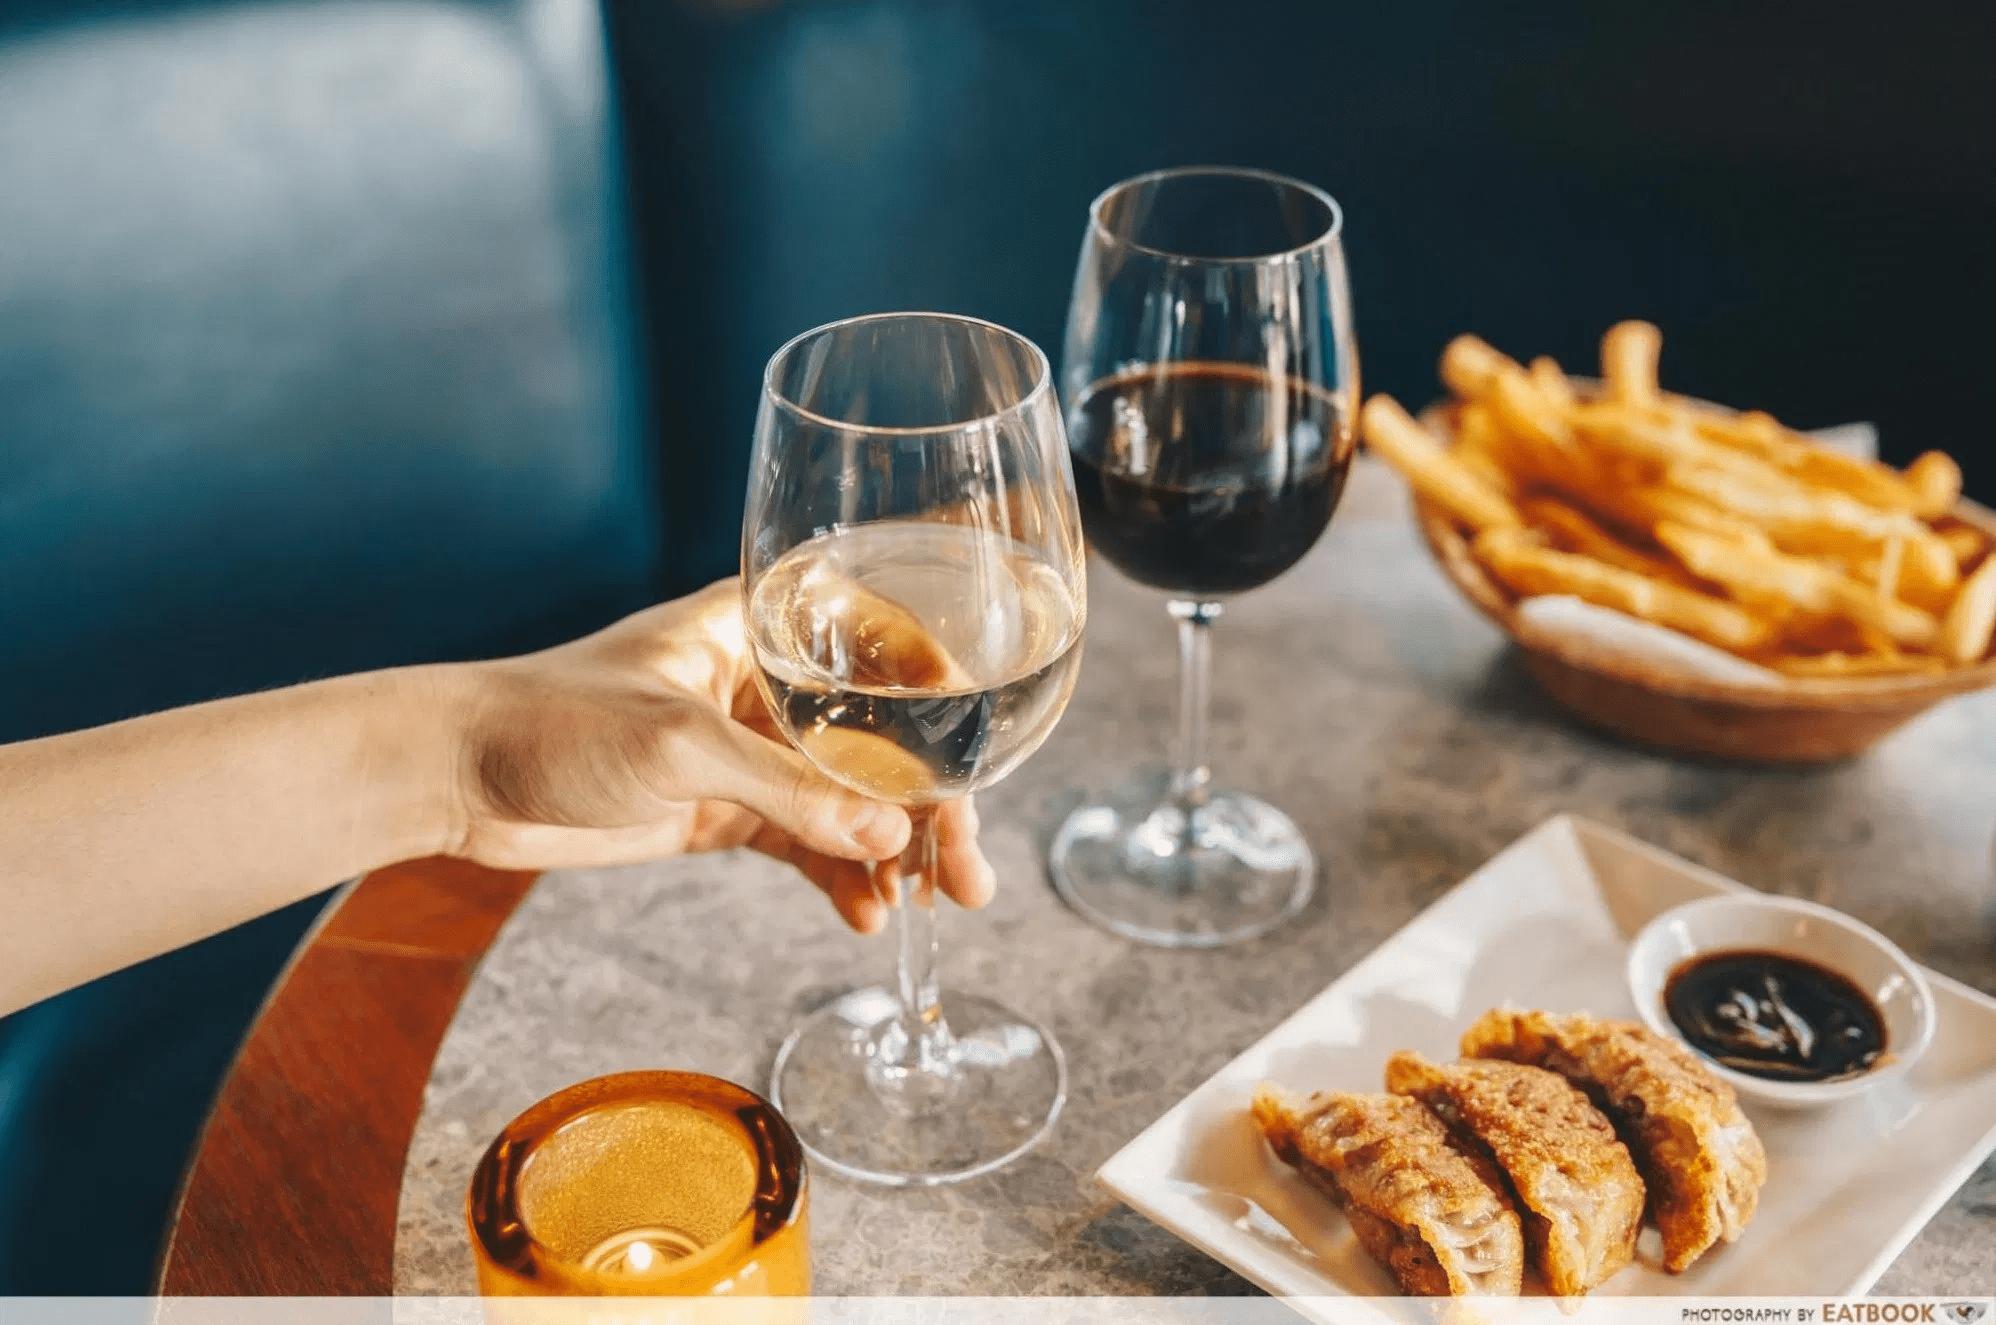 1-for-1 deals - clarke quay - prive - wine